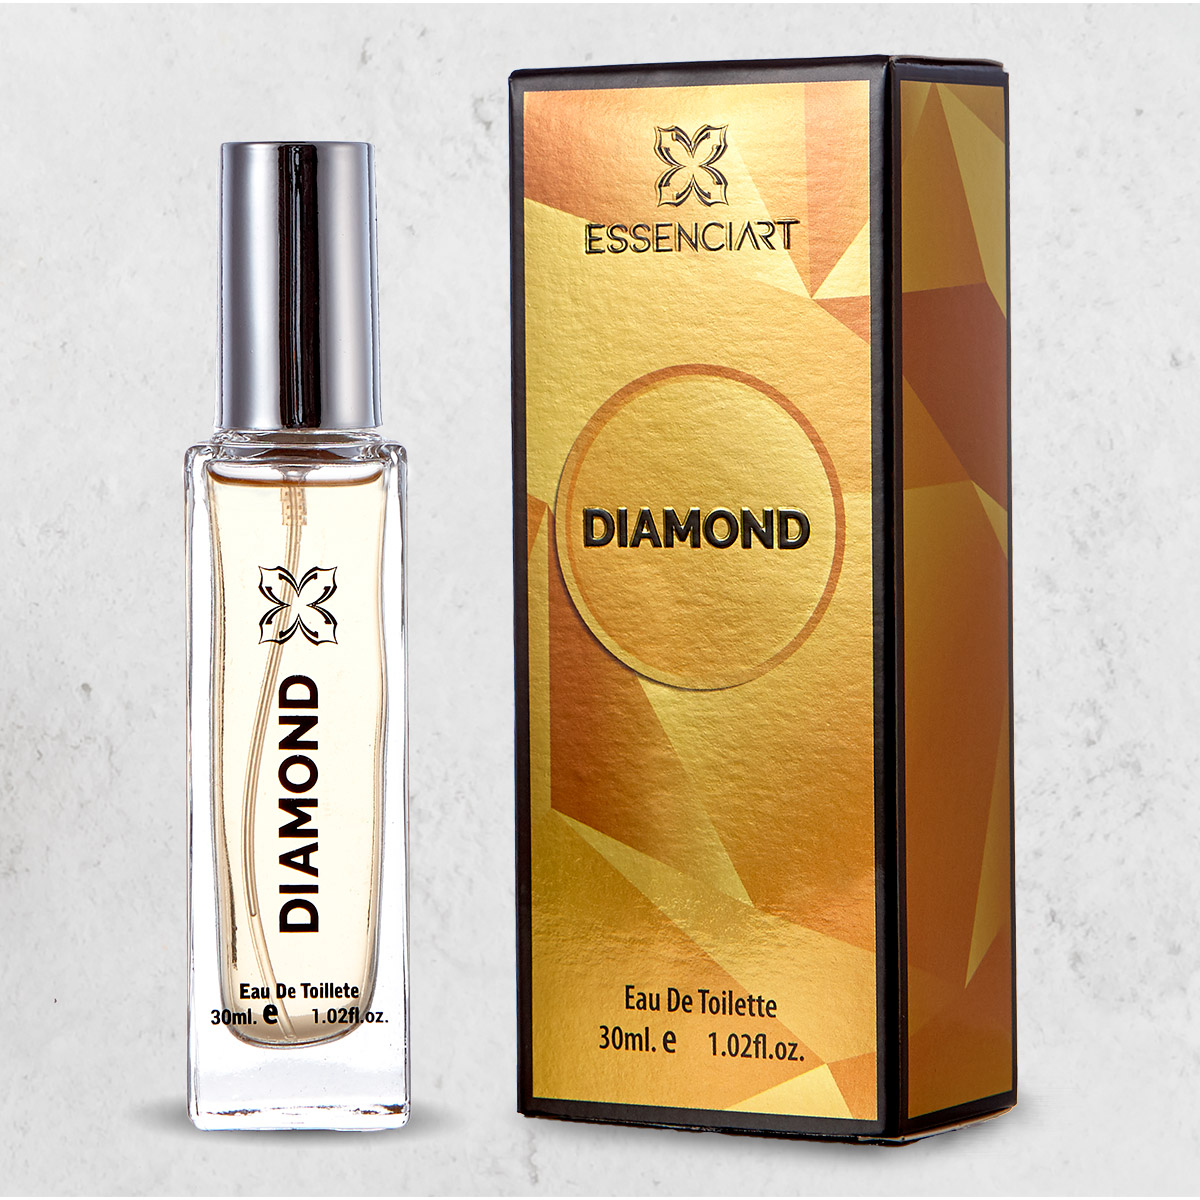 Essenciart Diamond Perfume Masculino Importado Edt 30ml